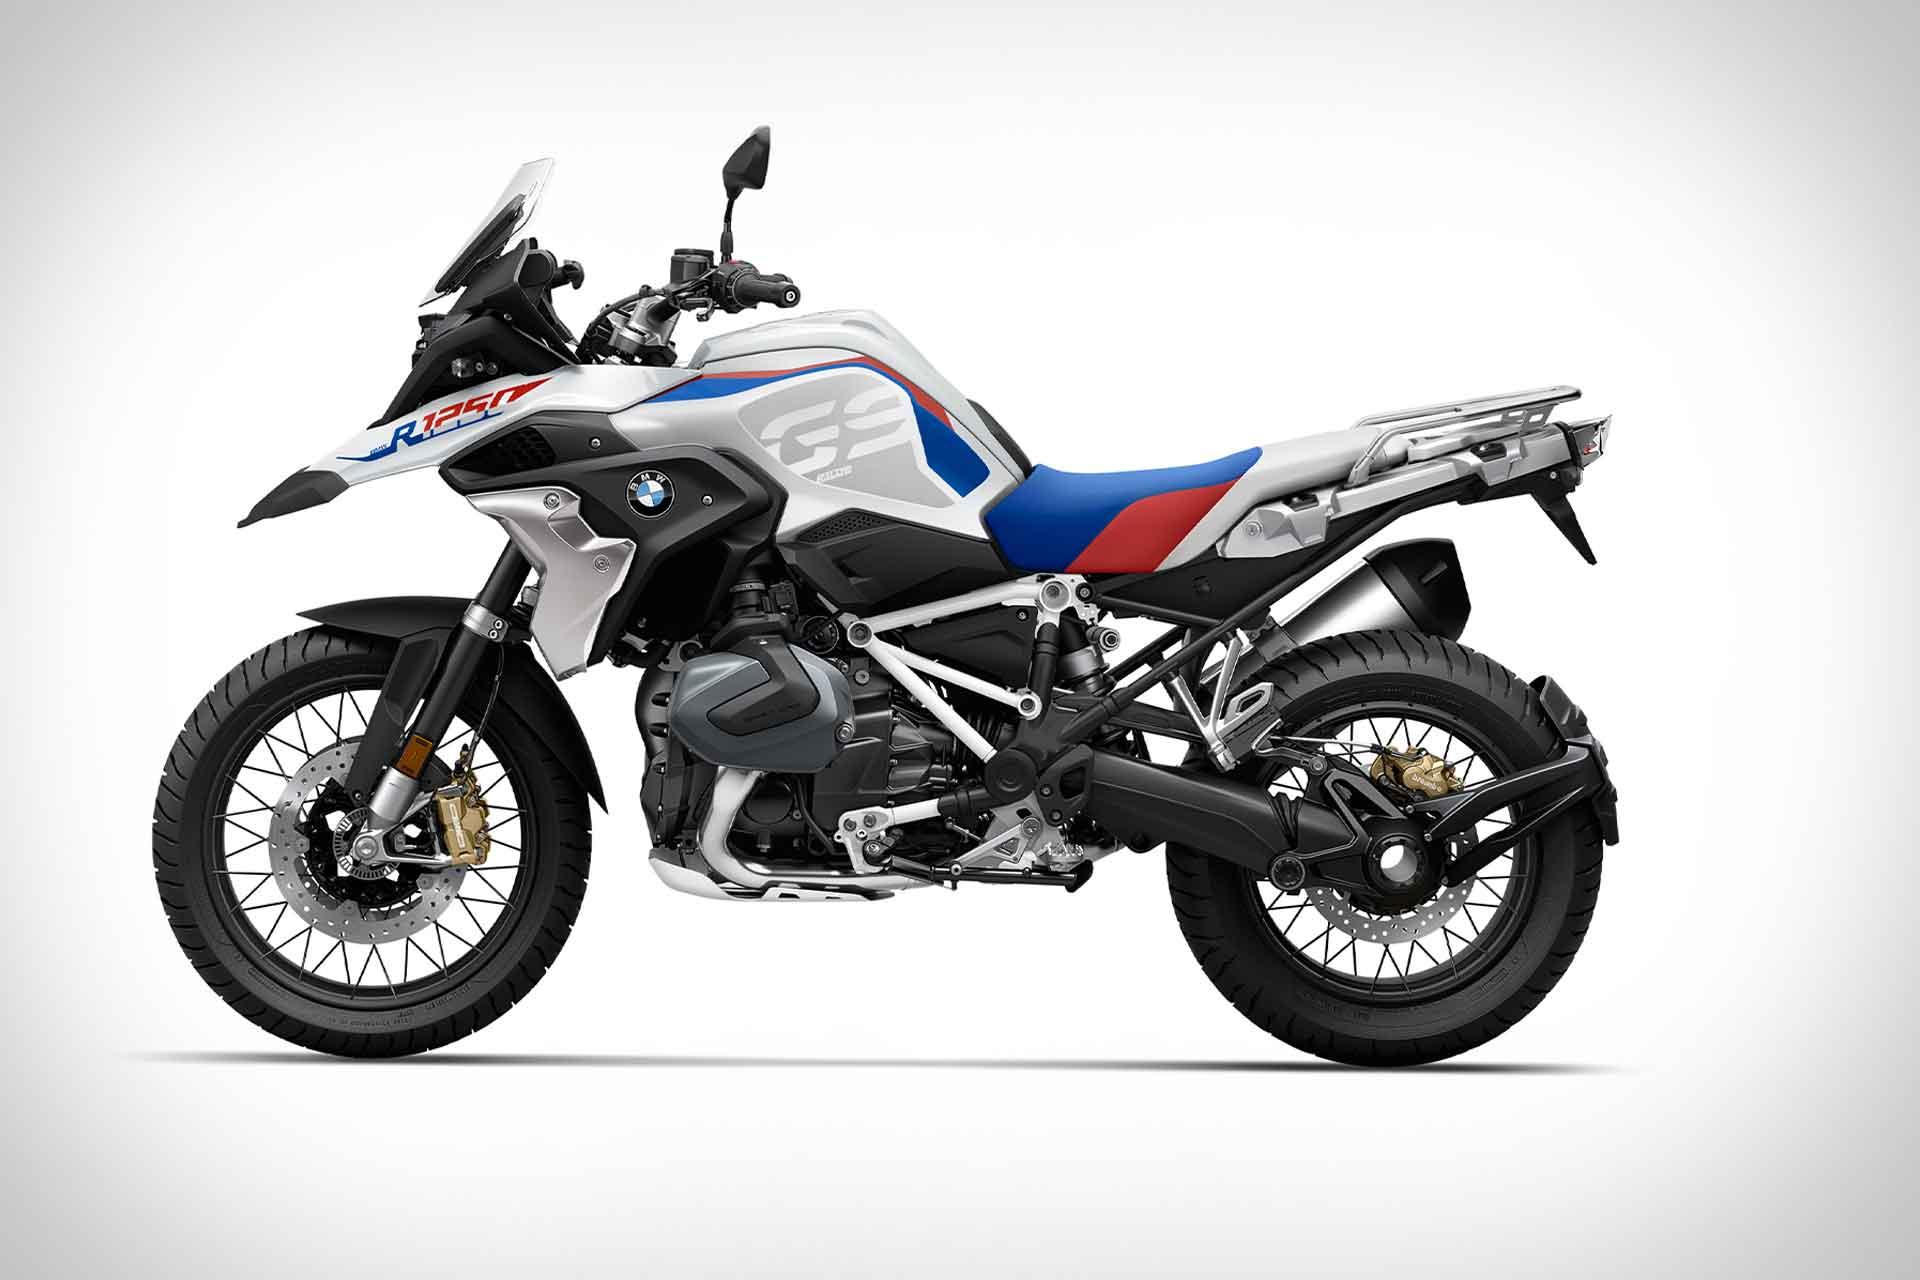 2021 BMW R 1250 GS Adventure Motorcycle | Uncrate